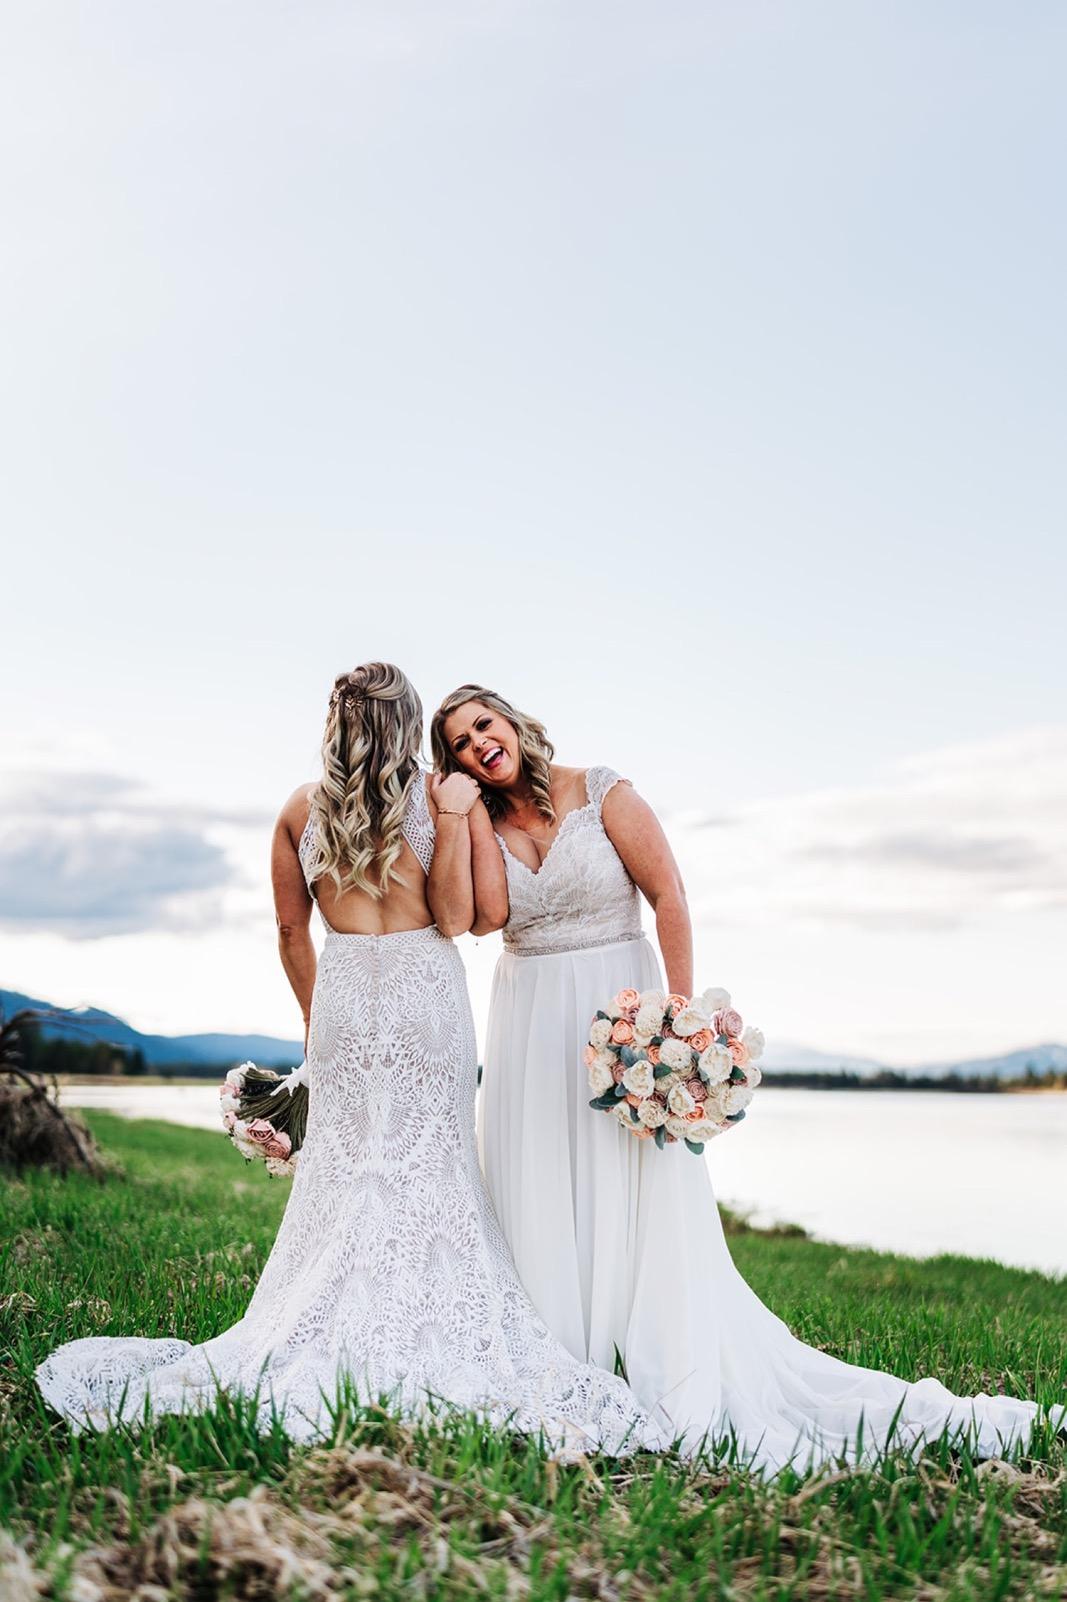 185_falissa_heather_wedding-528.jpg